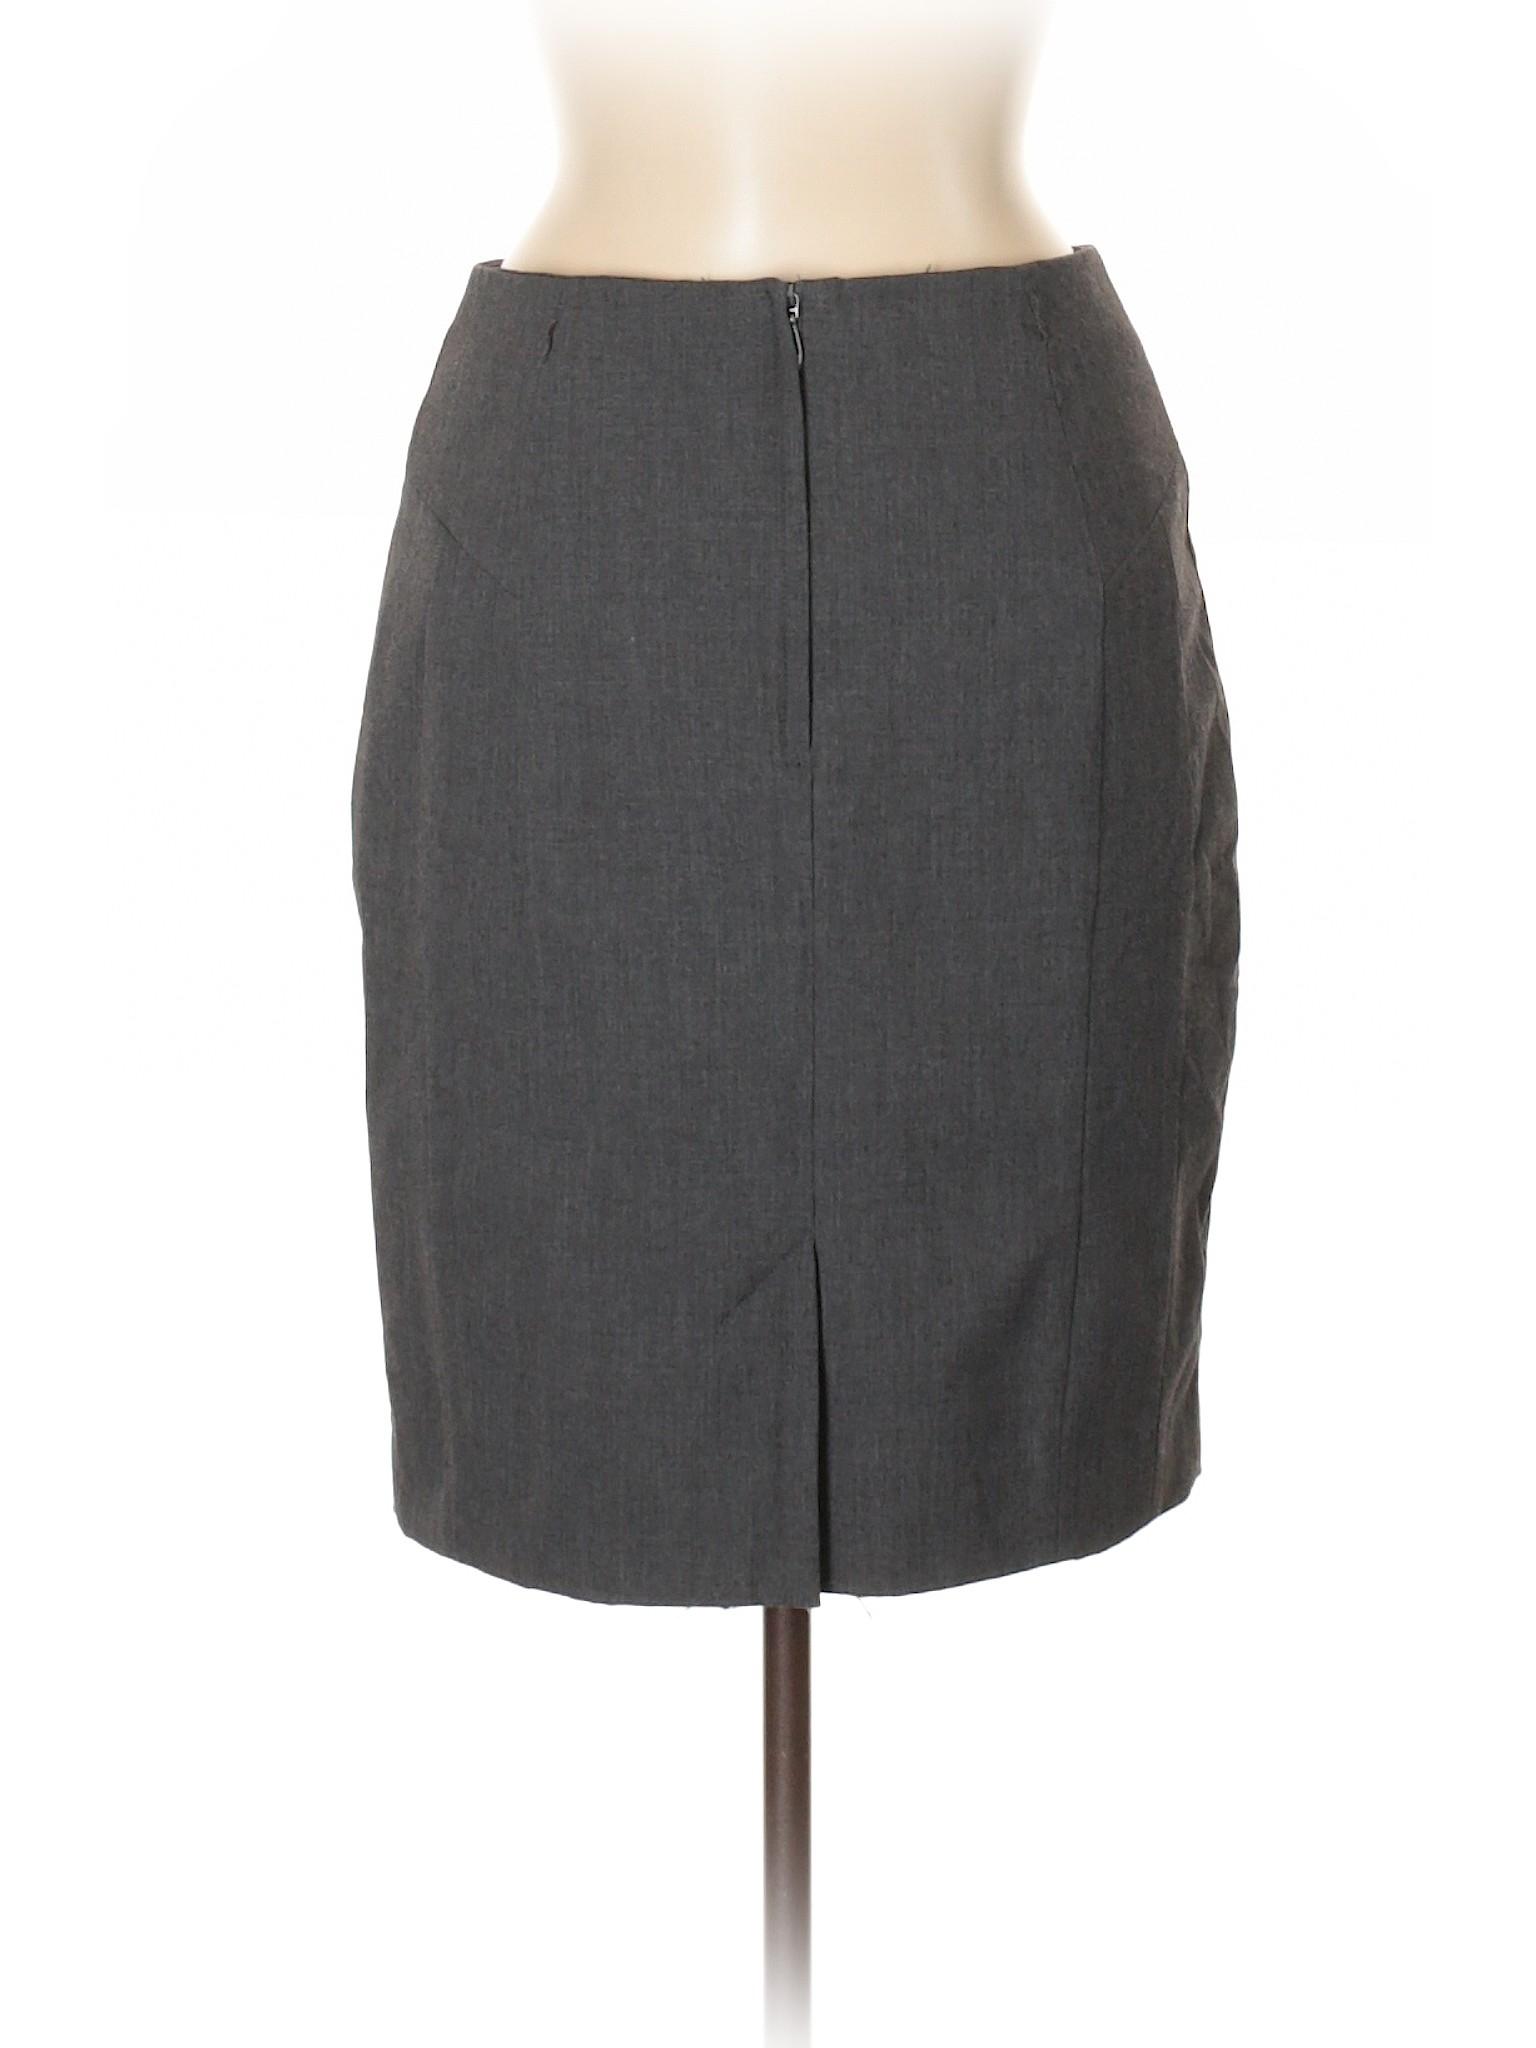 Boutique Casual Casual Boutique Skirt Boutique Skirt Boutique Skirt Casual Boutique Casual Skirt zxgYwq0WX